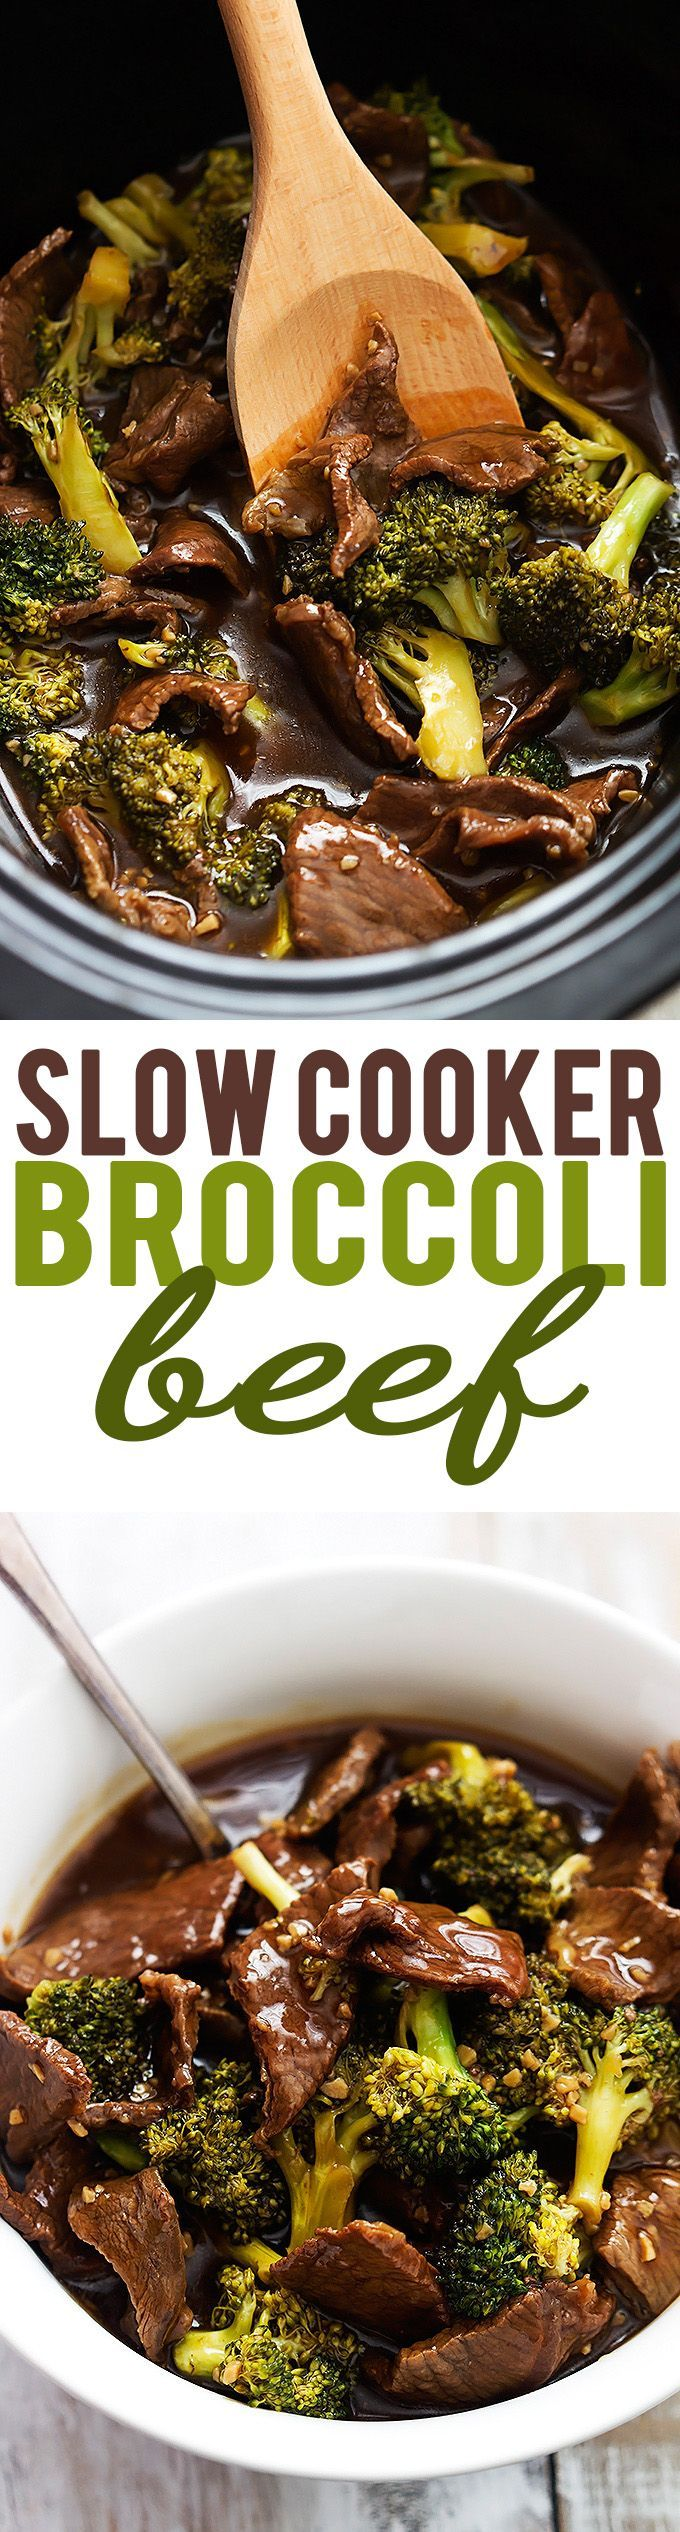 Slow Cooker Broccoli Beef | YourCookNow